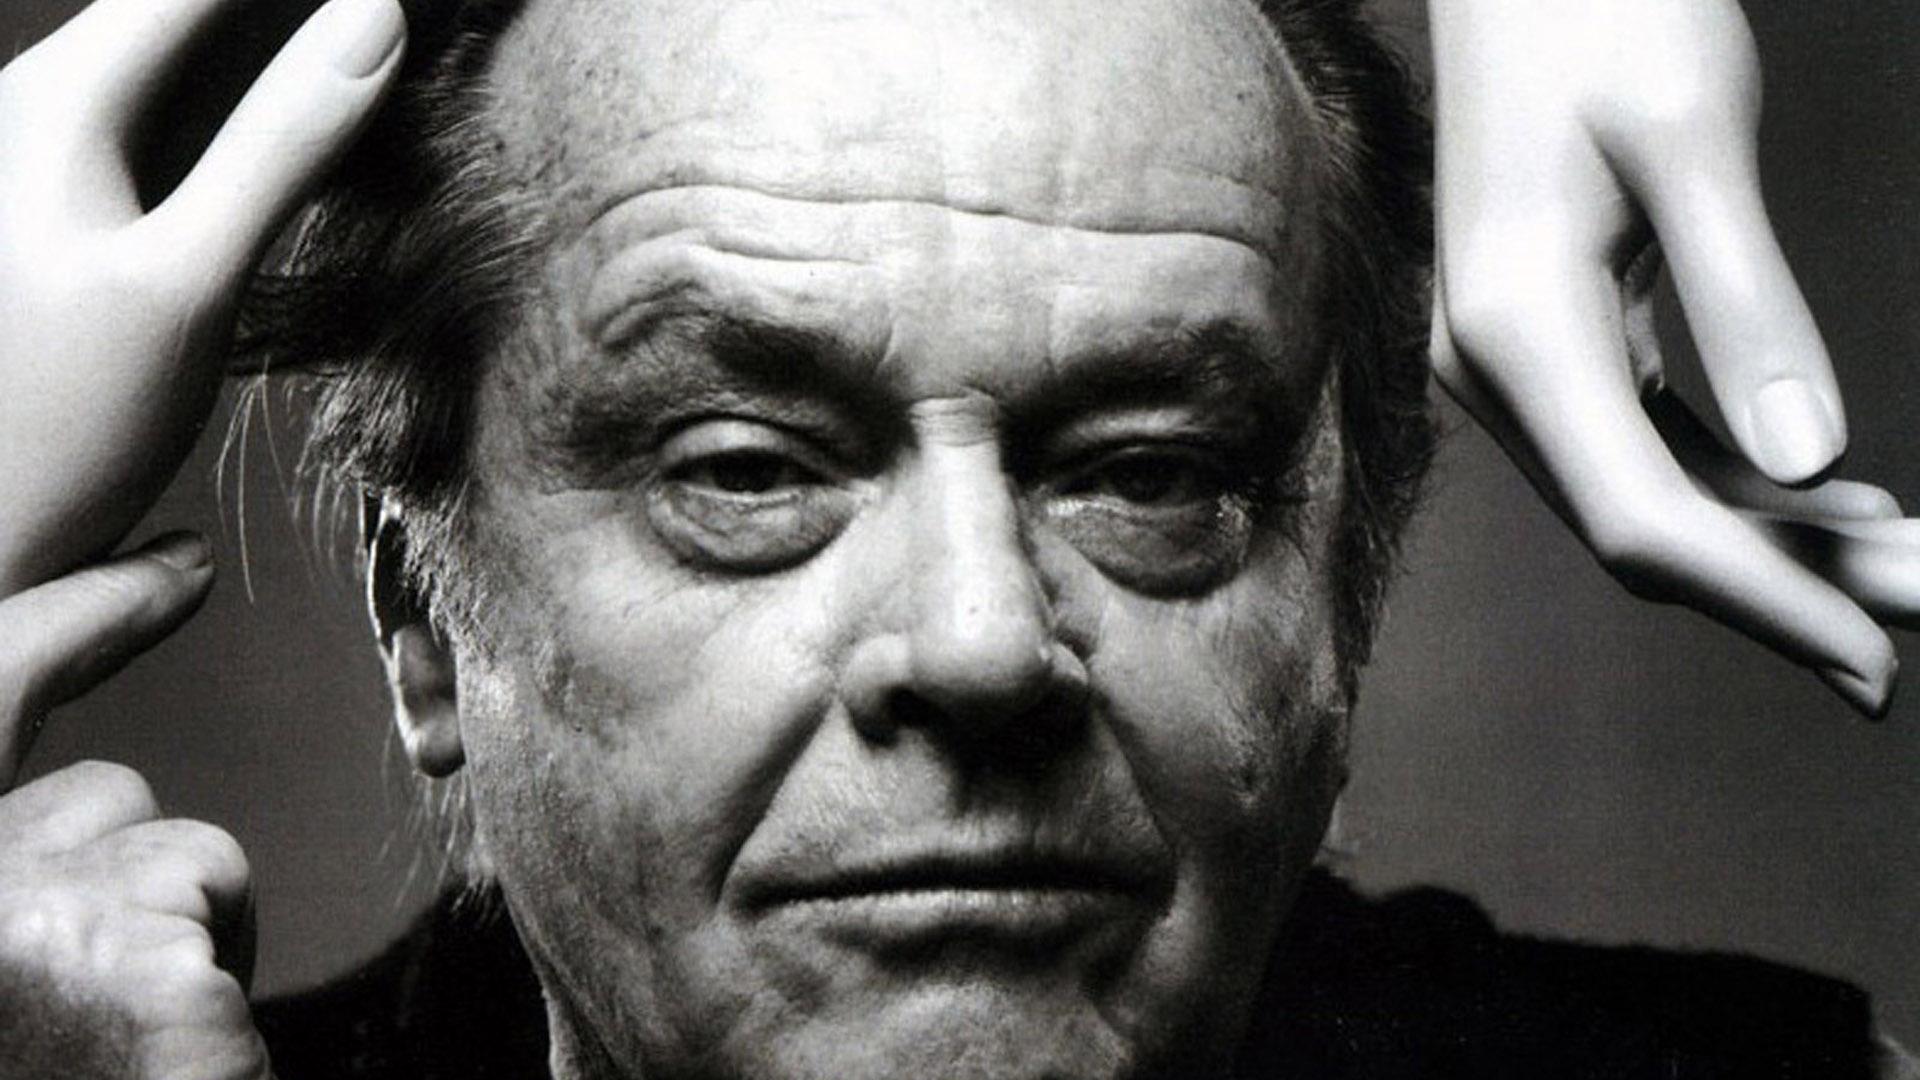 Jack Nicholson Wallpapers 1920x1080